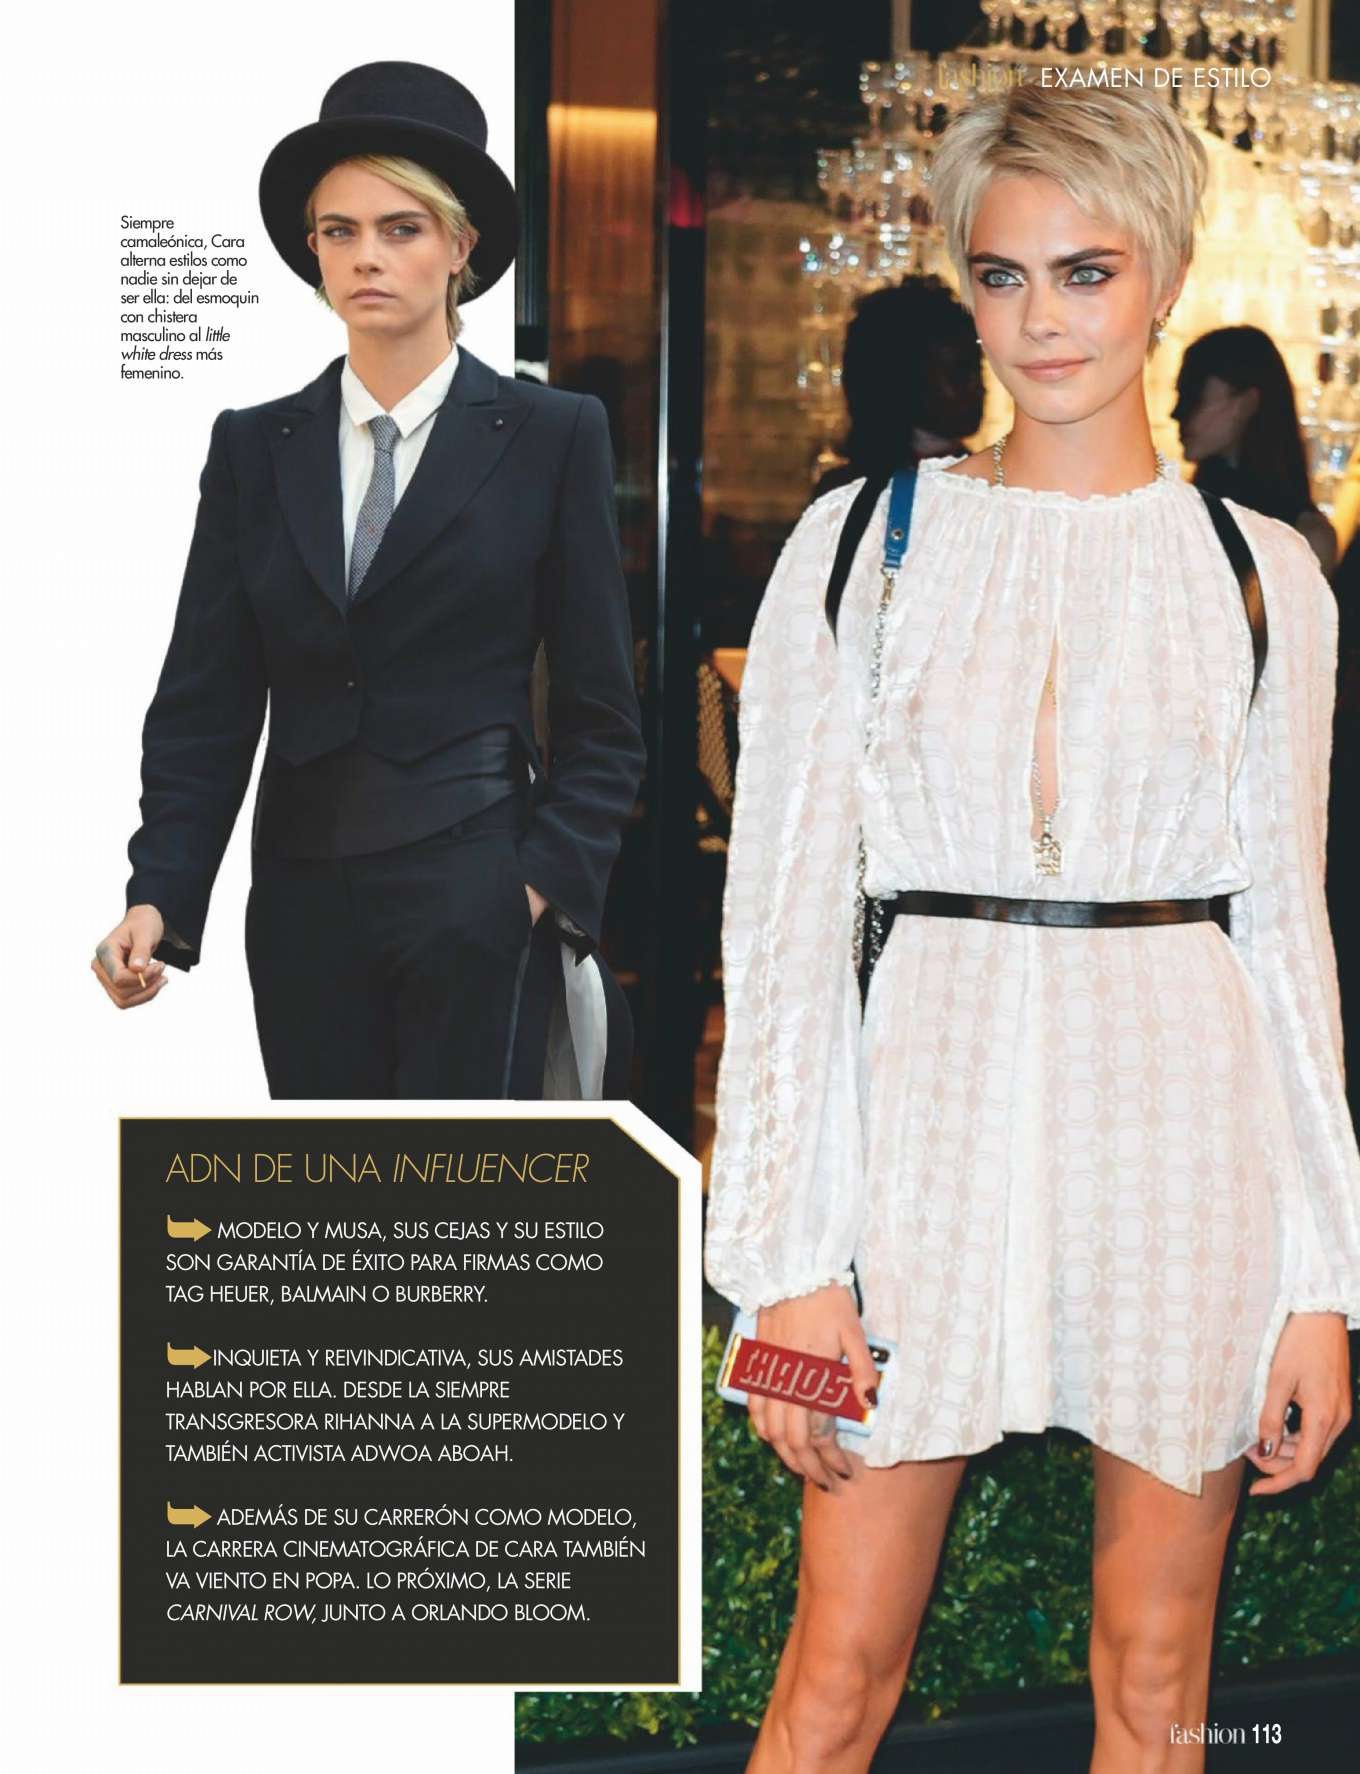 Cara Delevingne 2019 : Cara Delevingne: ¡Hola! Fashion 2019 -03